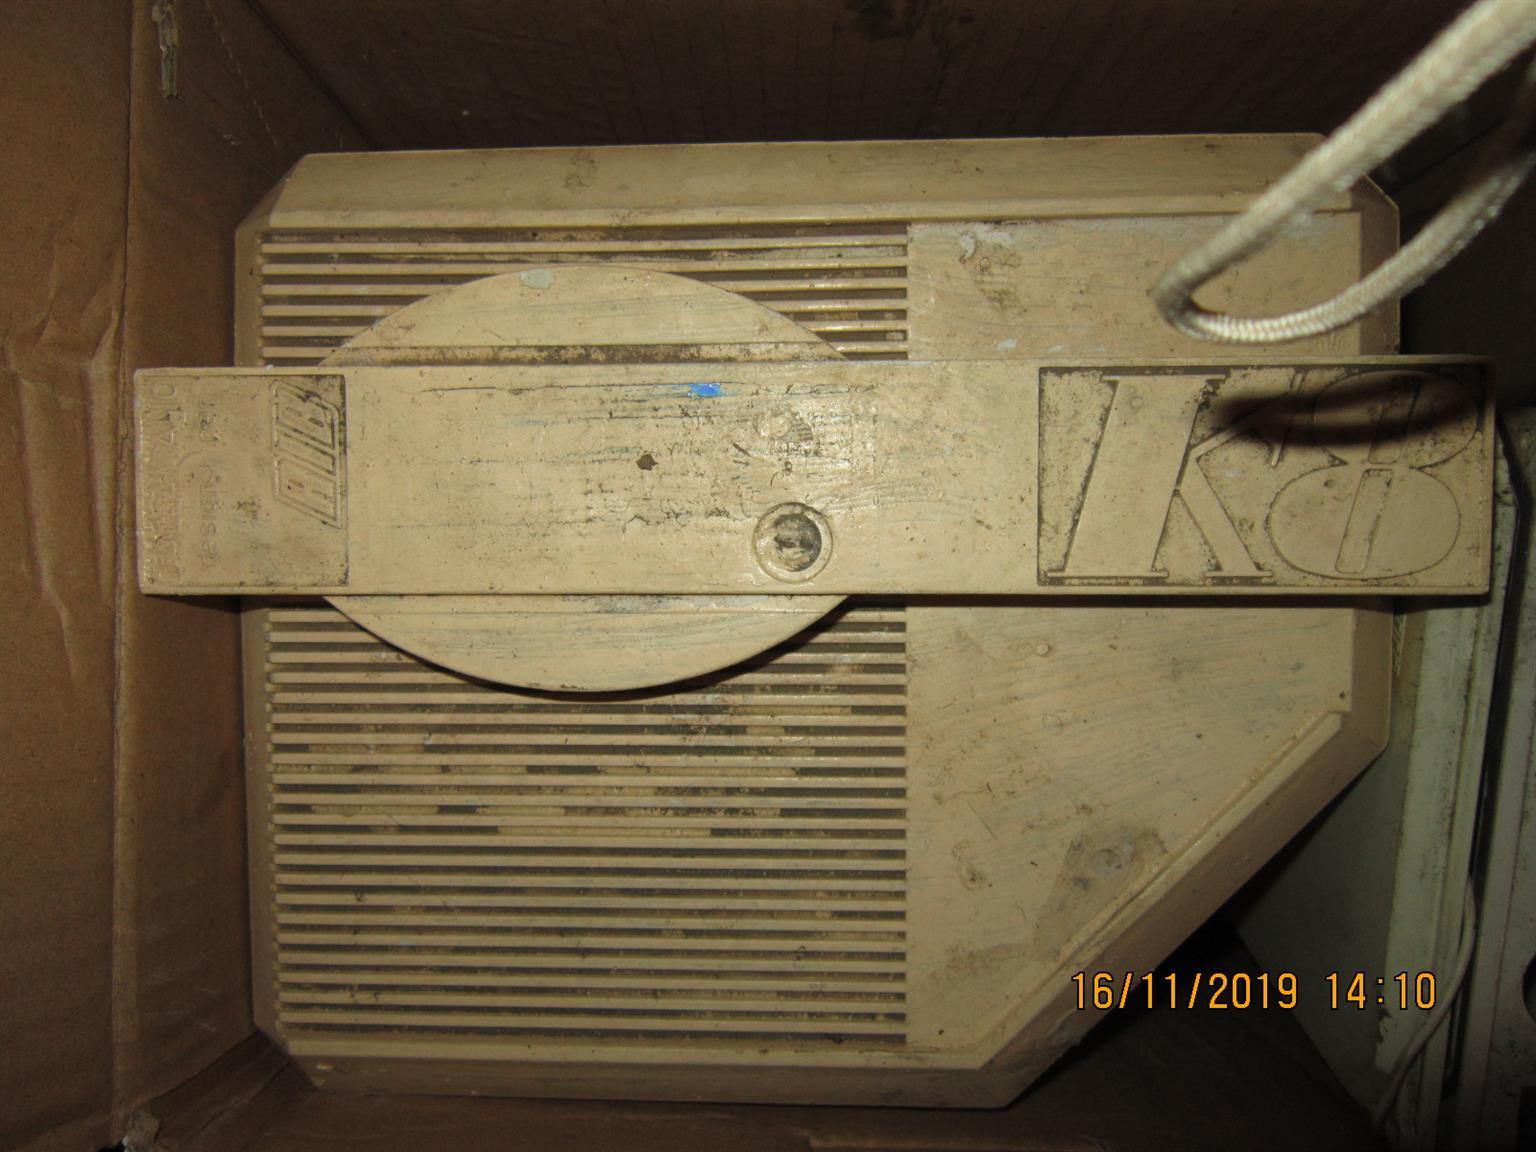 OLD RIB K8 GATE MOTOR FOR SPARES